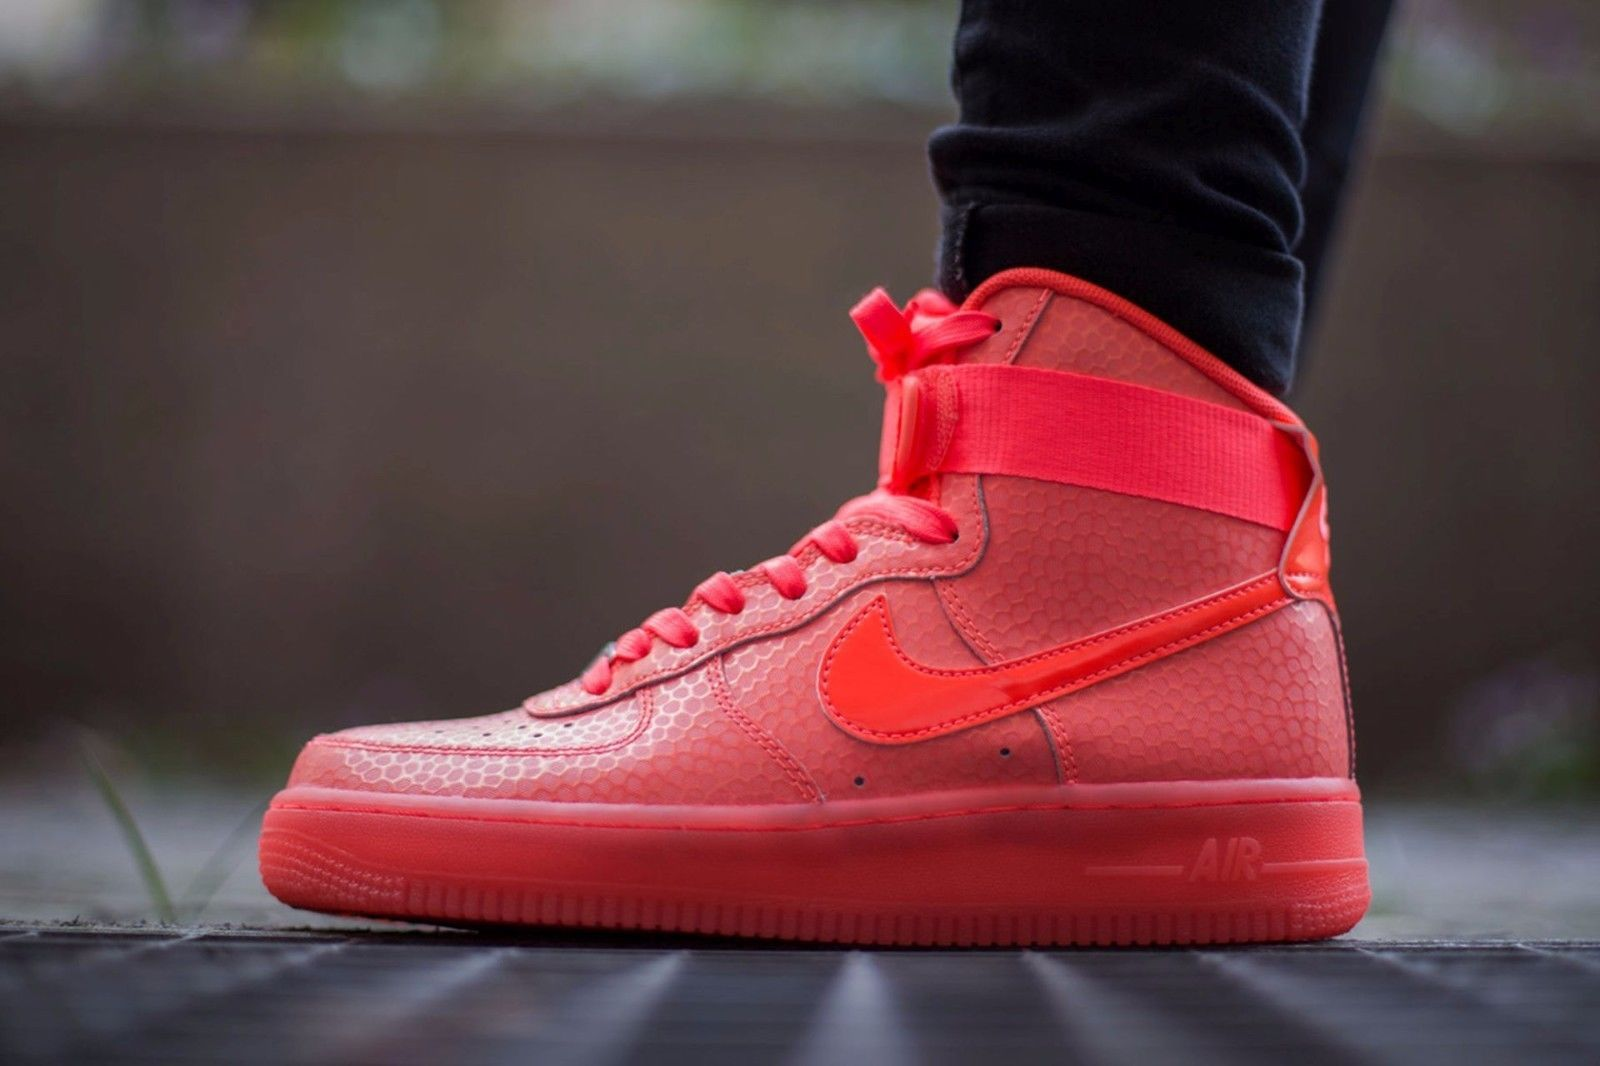 best service a9ac1 53874 Nike Air Force 1 Hi Premium Hot Lava Womens Shoes Size 9 654440-800